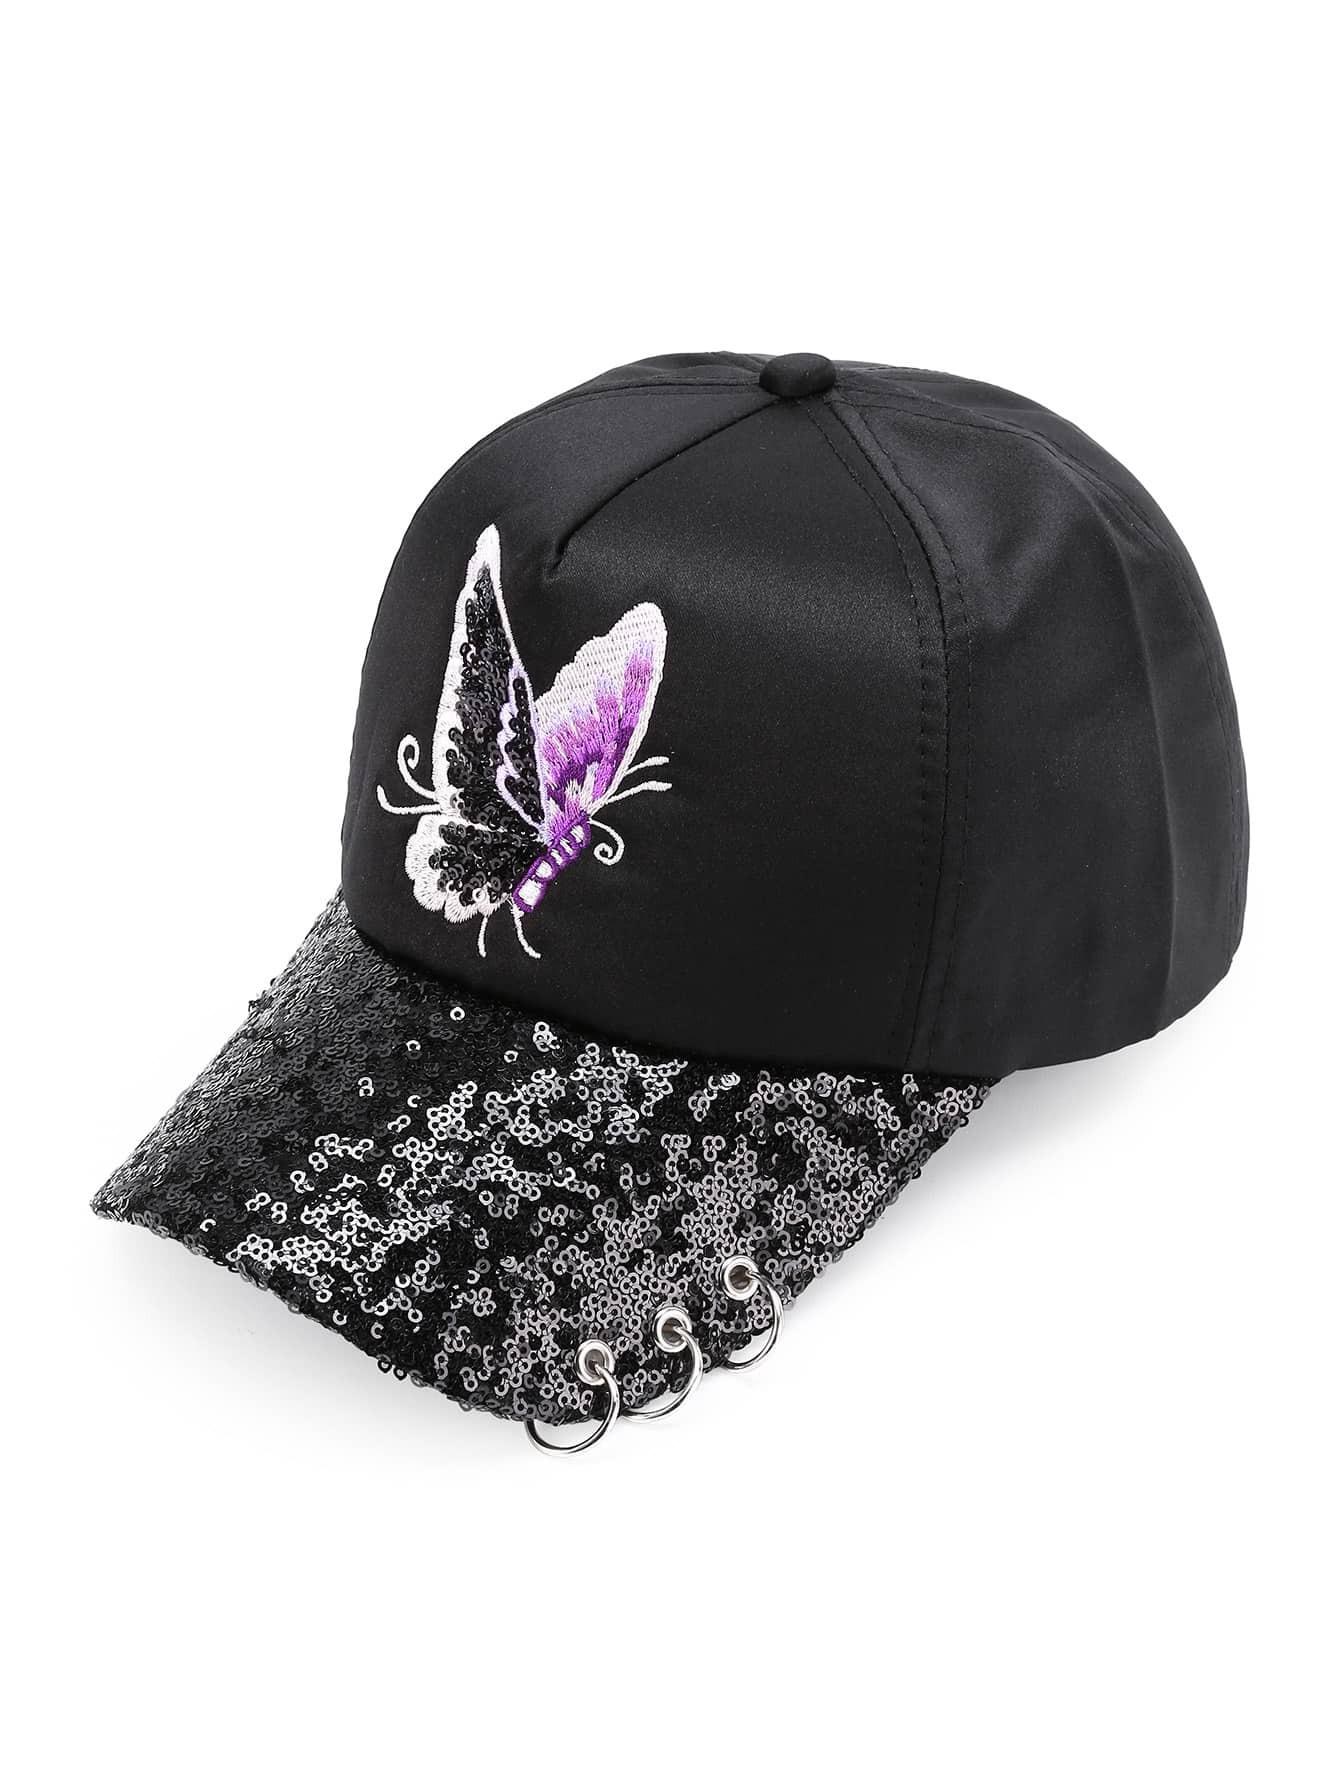 Фото Butterfly Embroidery Sequin Baseball Cap. Купить с доставкой